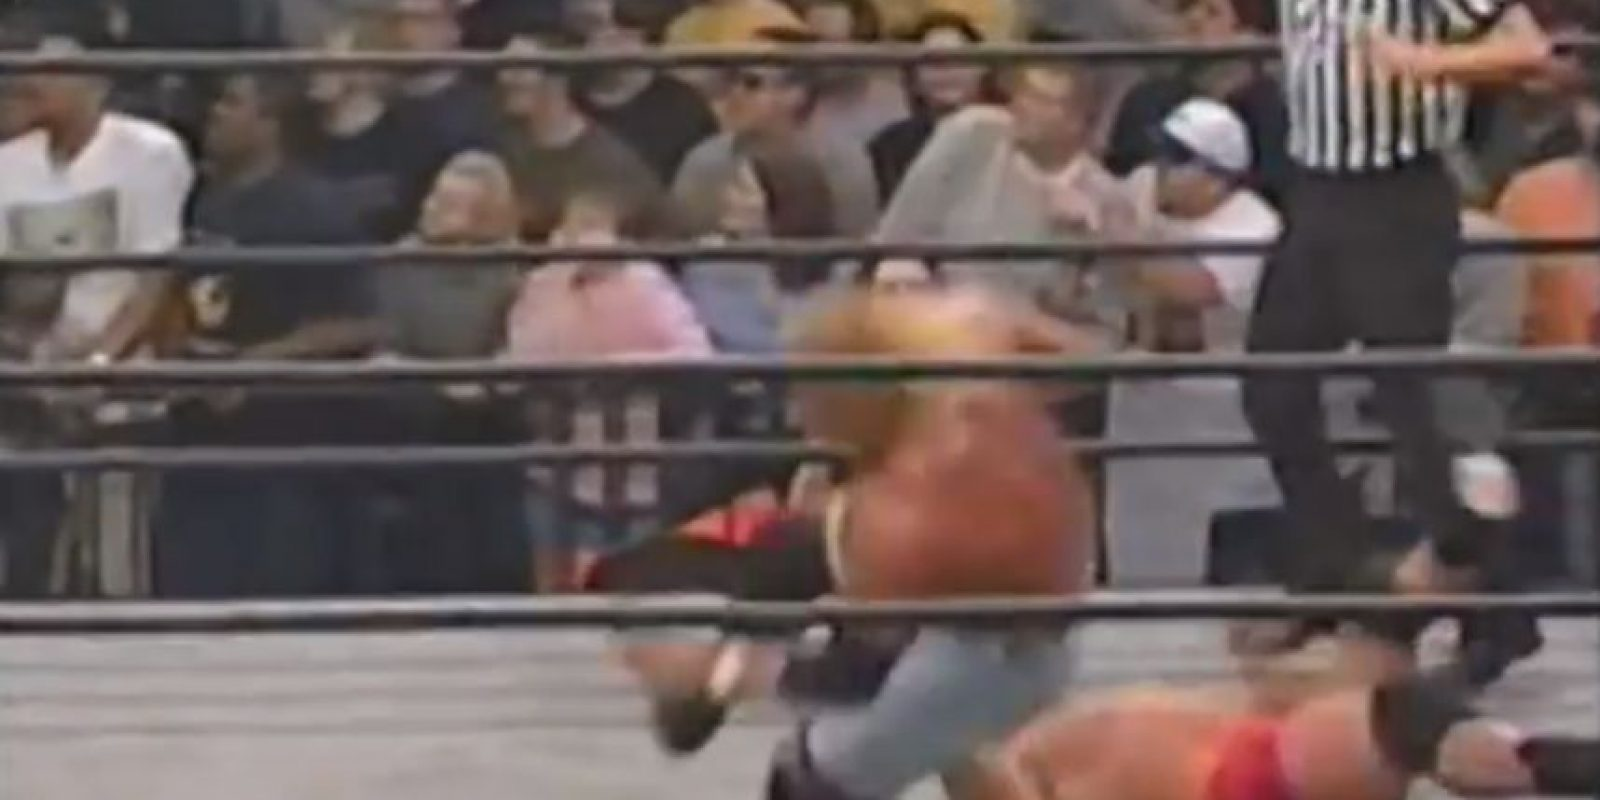 Se rompió la pierna de forma brutal, luego de caer de una mala manera Foto:WWE